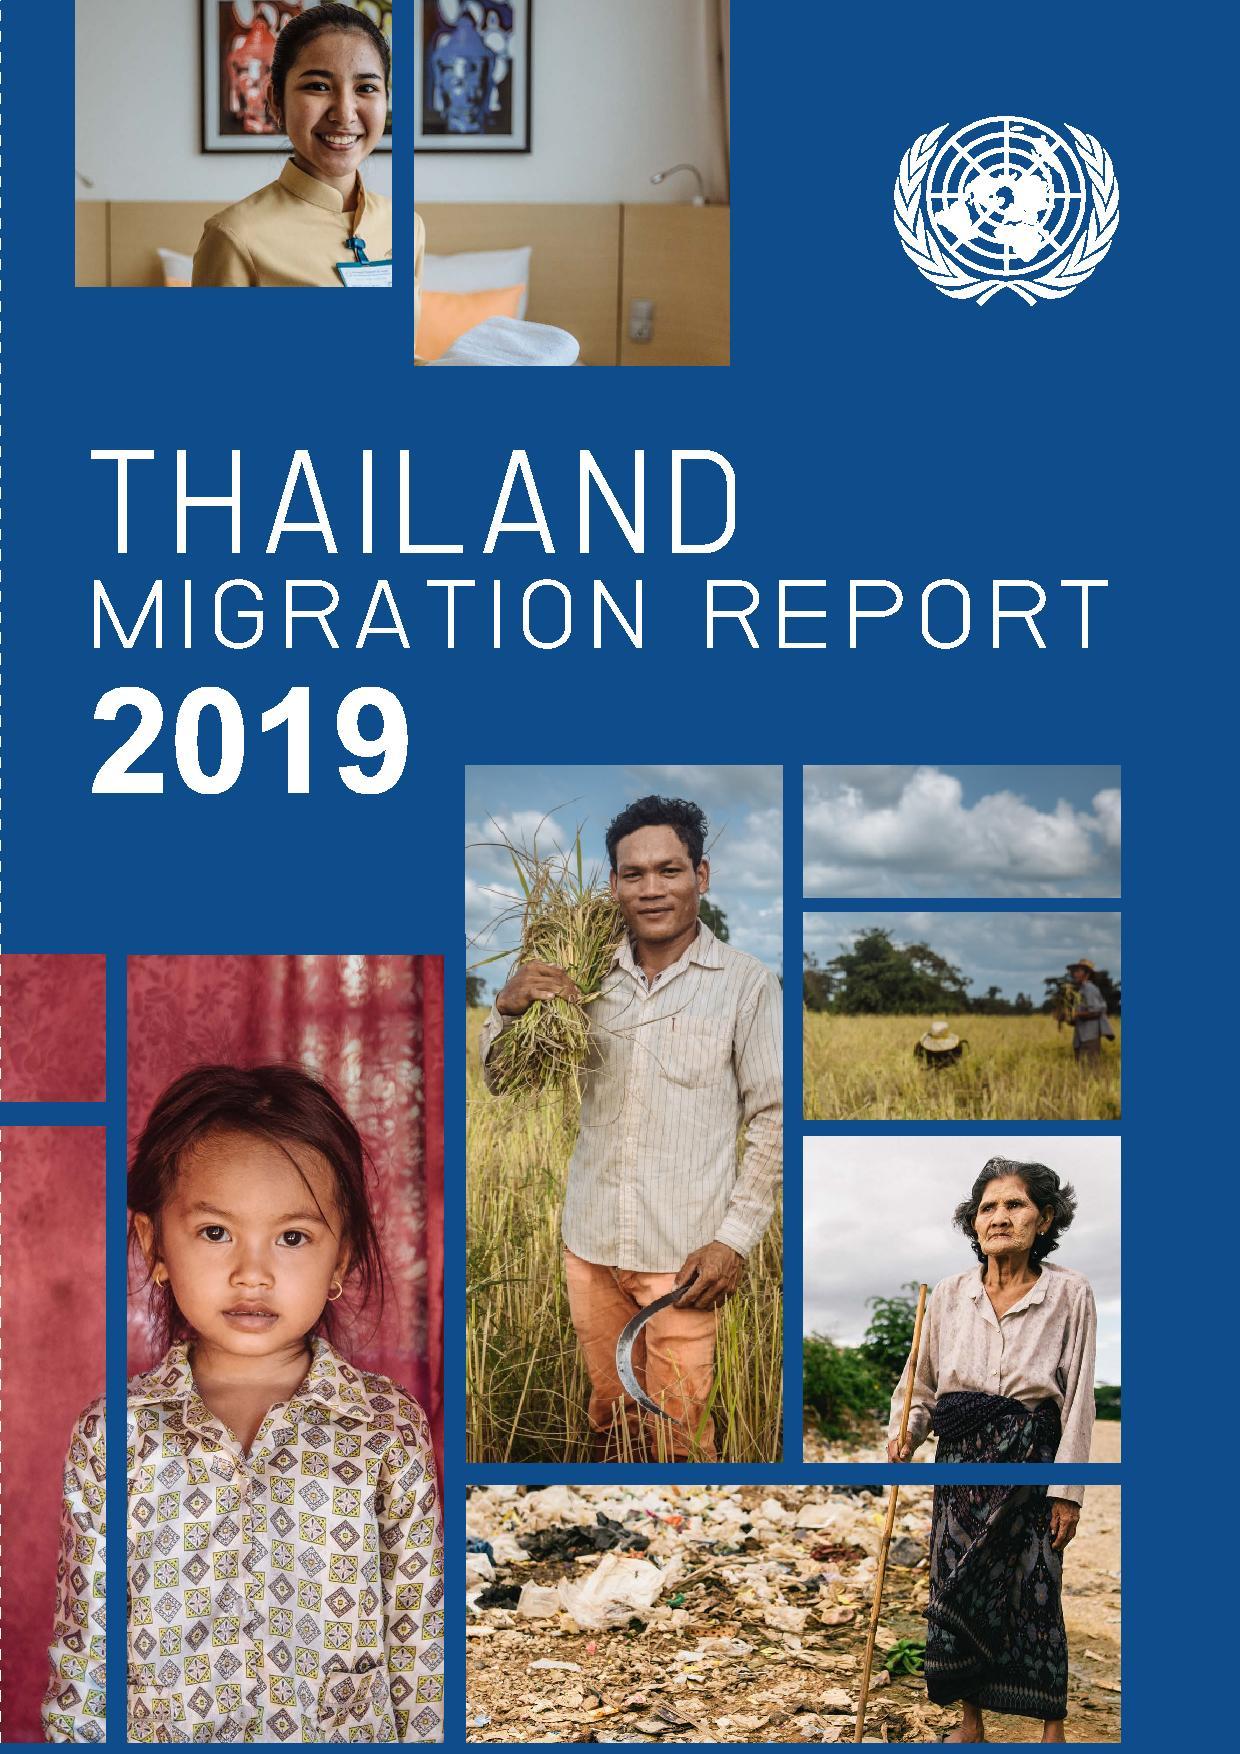 Thailand Migration Report 2019